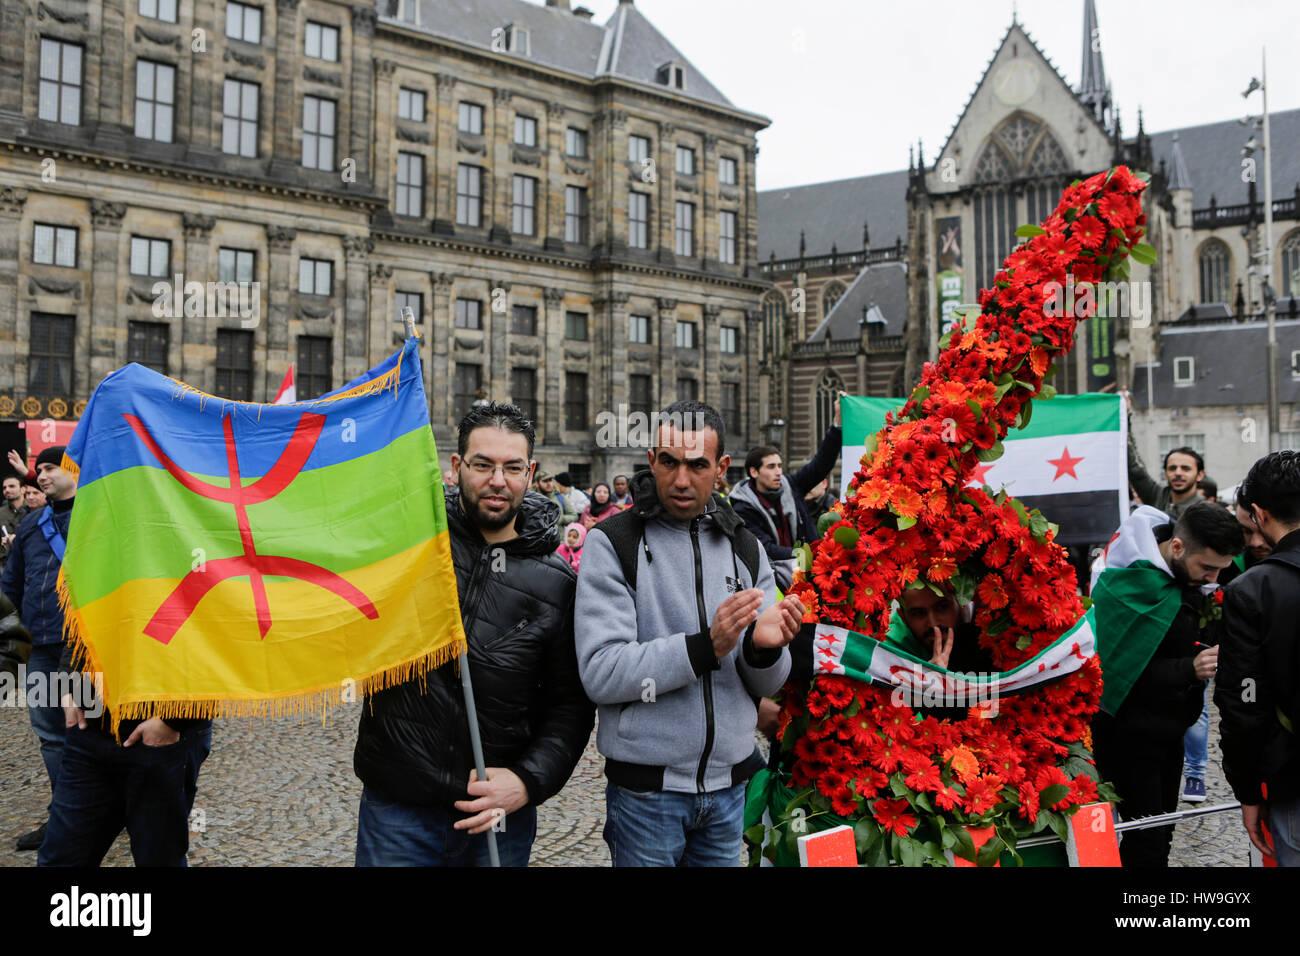 Berber Flag Stock Photos & Berber Flag Stock Images - Alamy